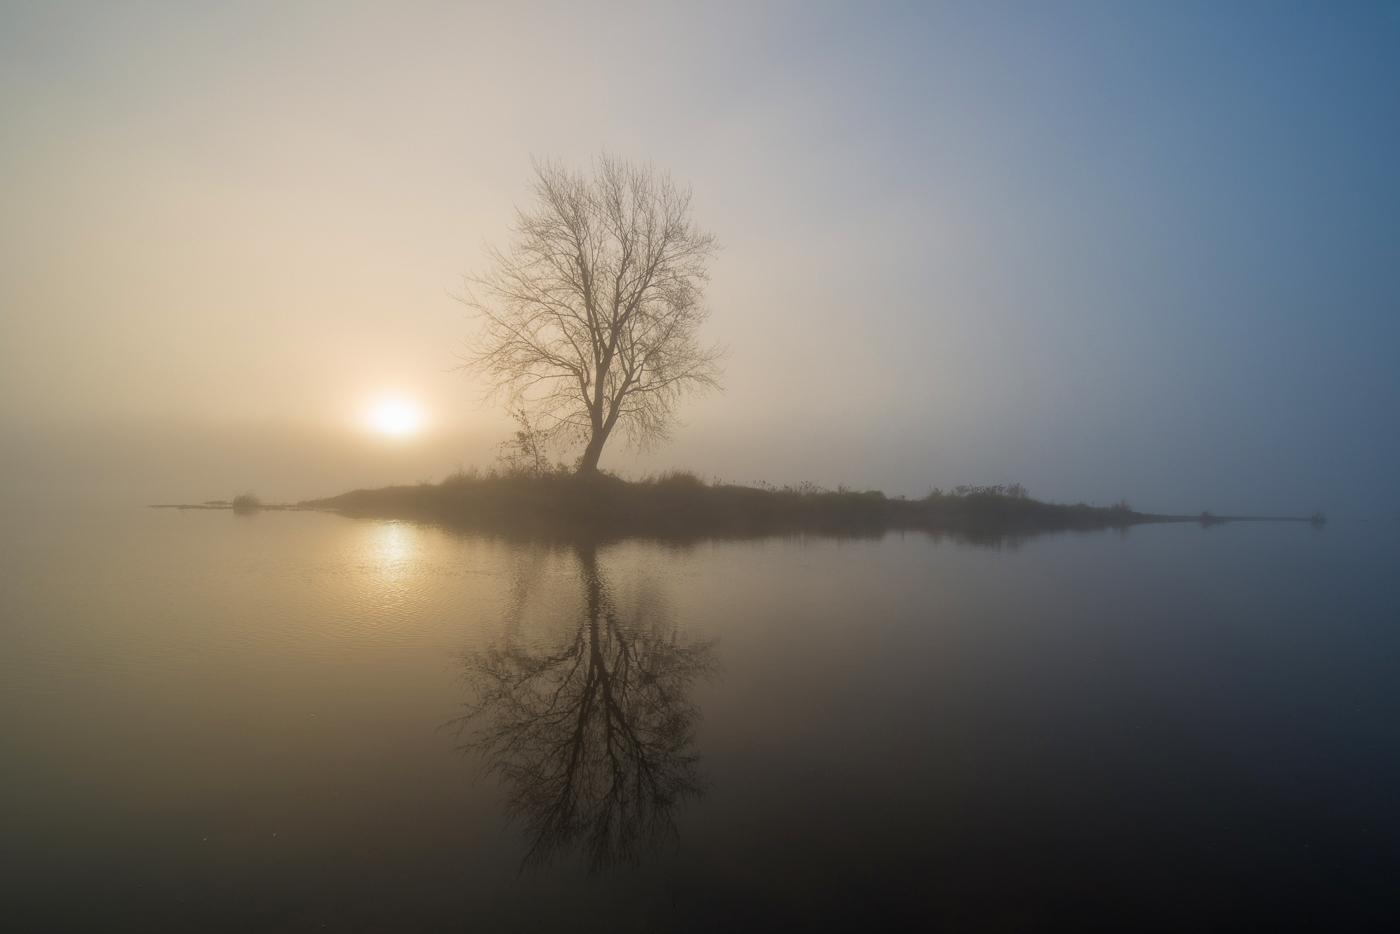 National Scenic River, River, St. Croix River, Sunrise, minnesota, reflections, wisconsin, photo